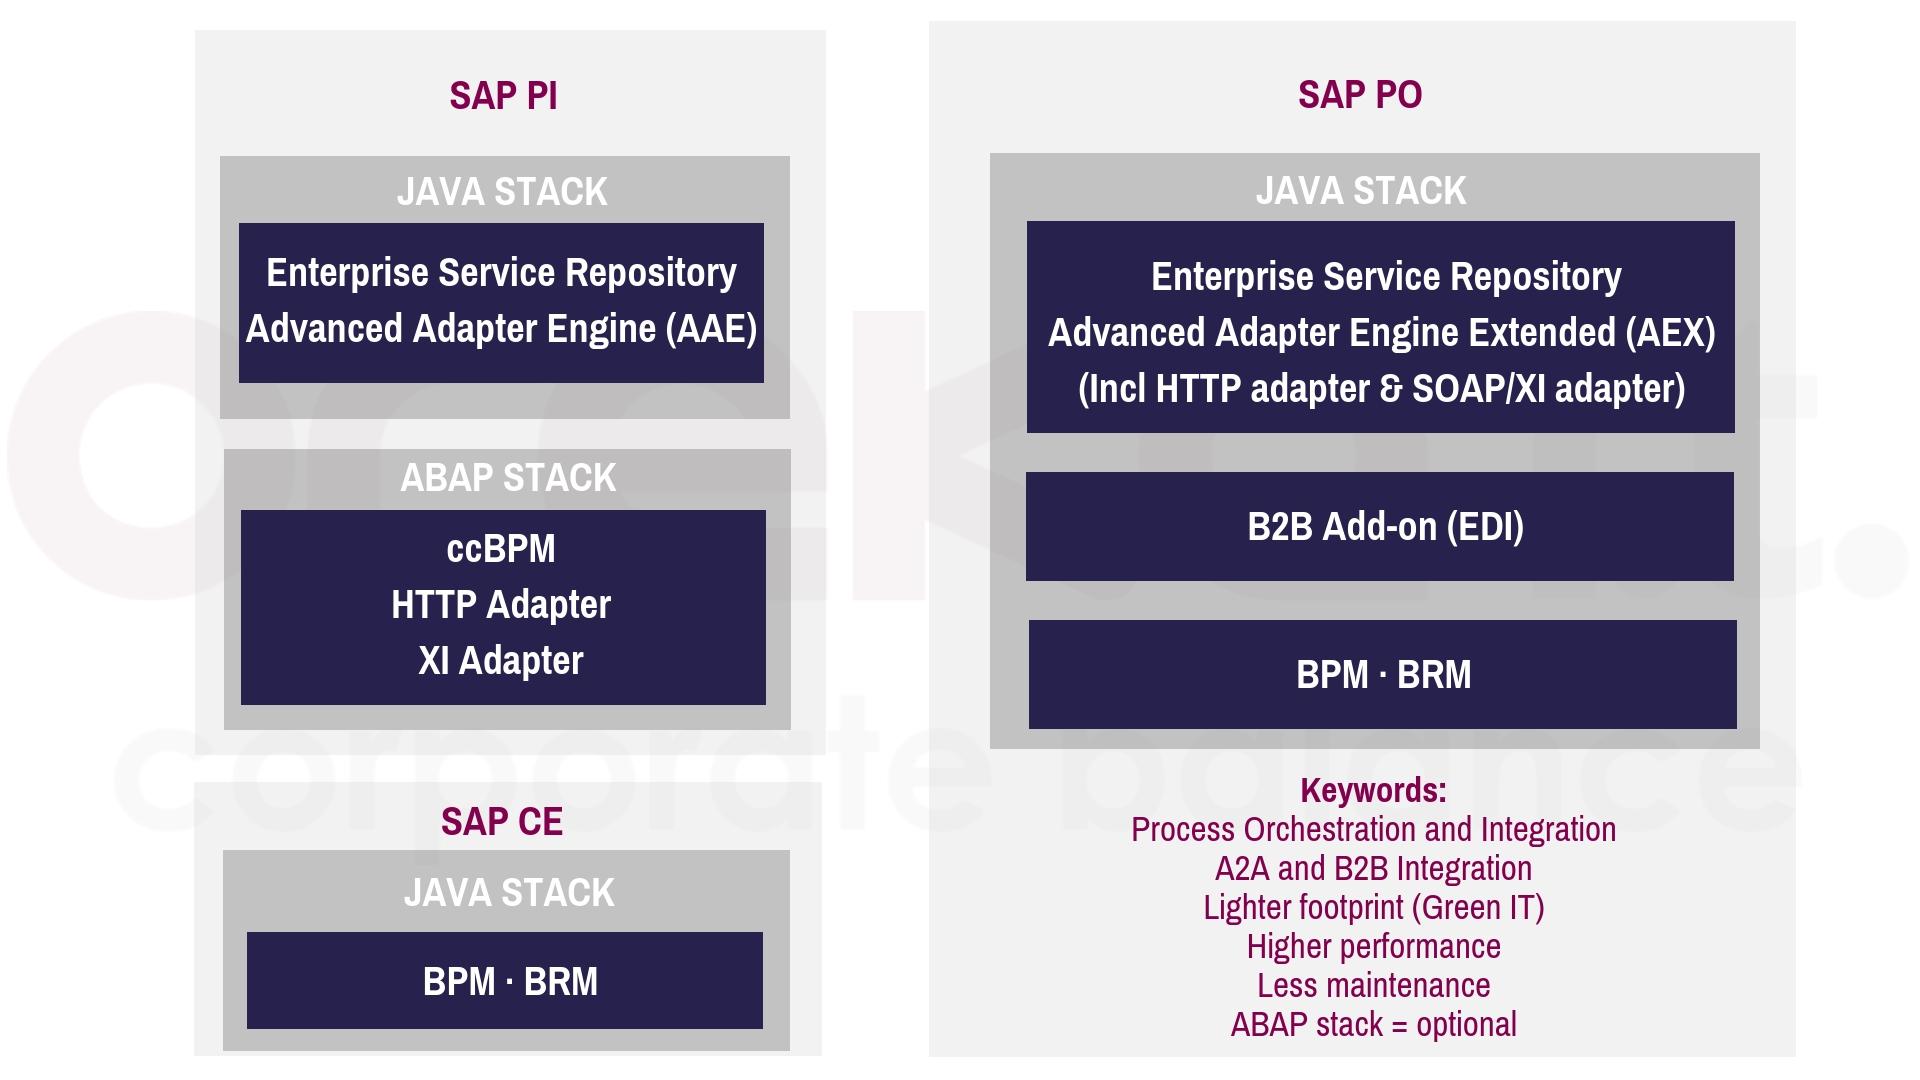 Diez razones para migrar a SAP PO (1)